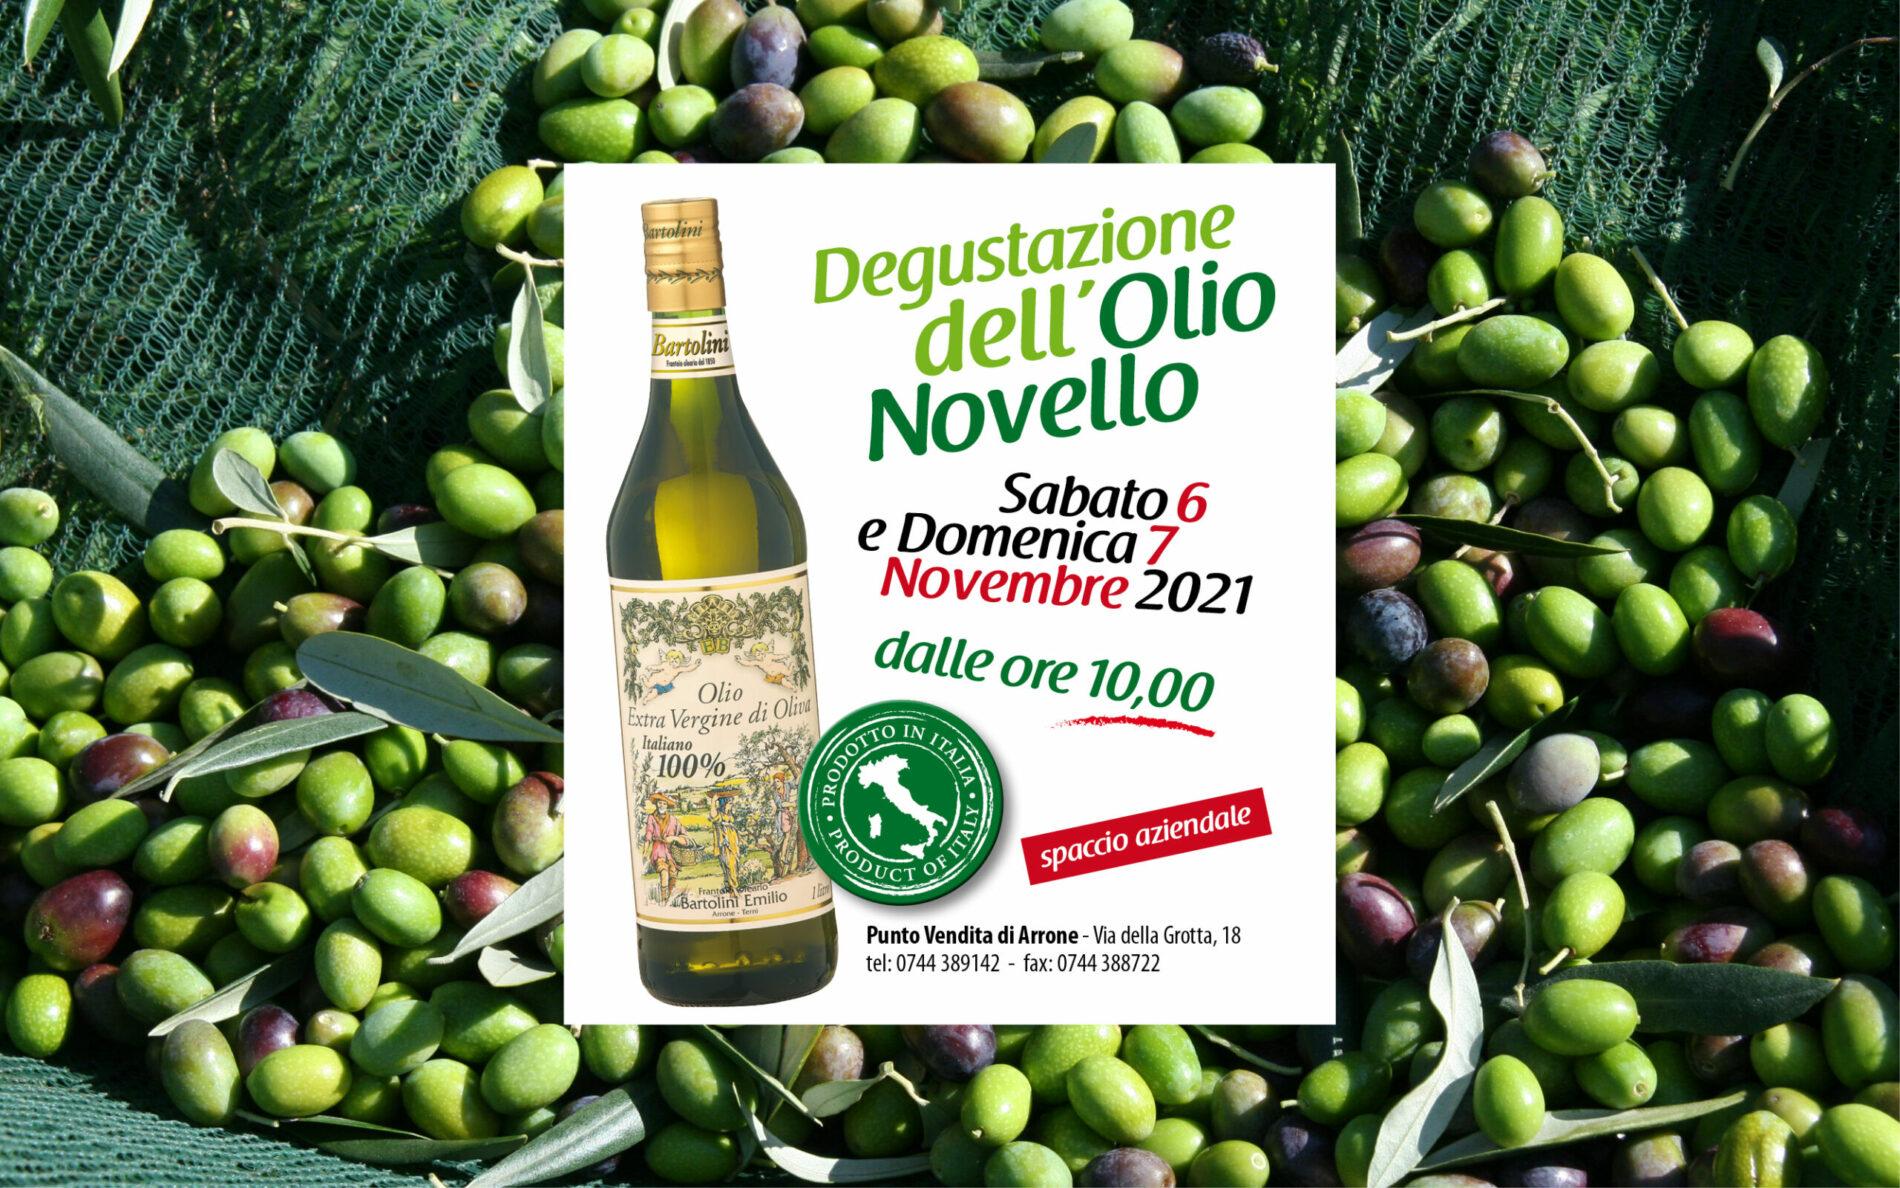 Olio Novello Bartolini Degustazione